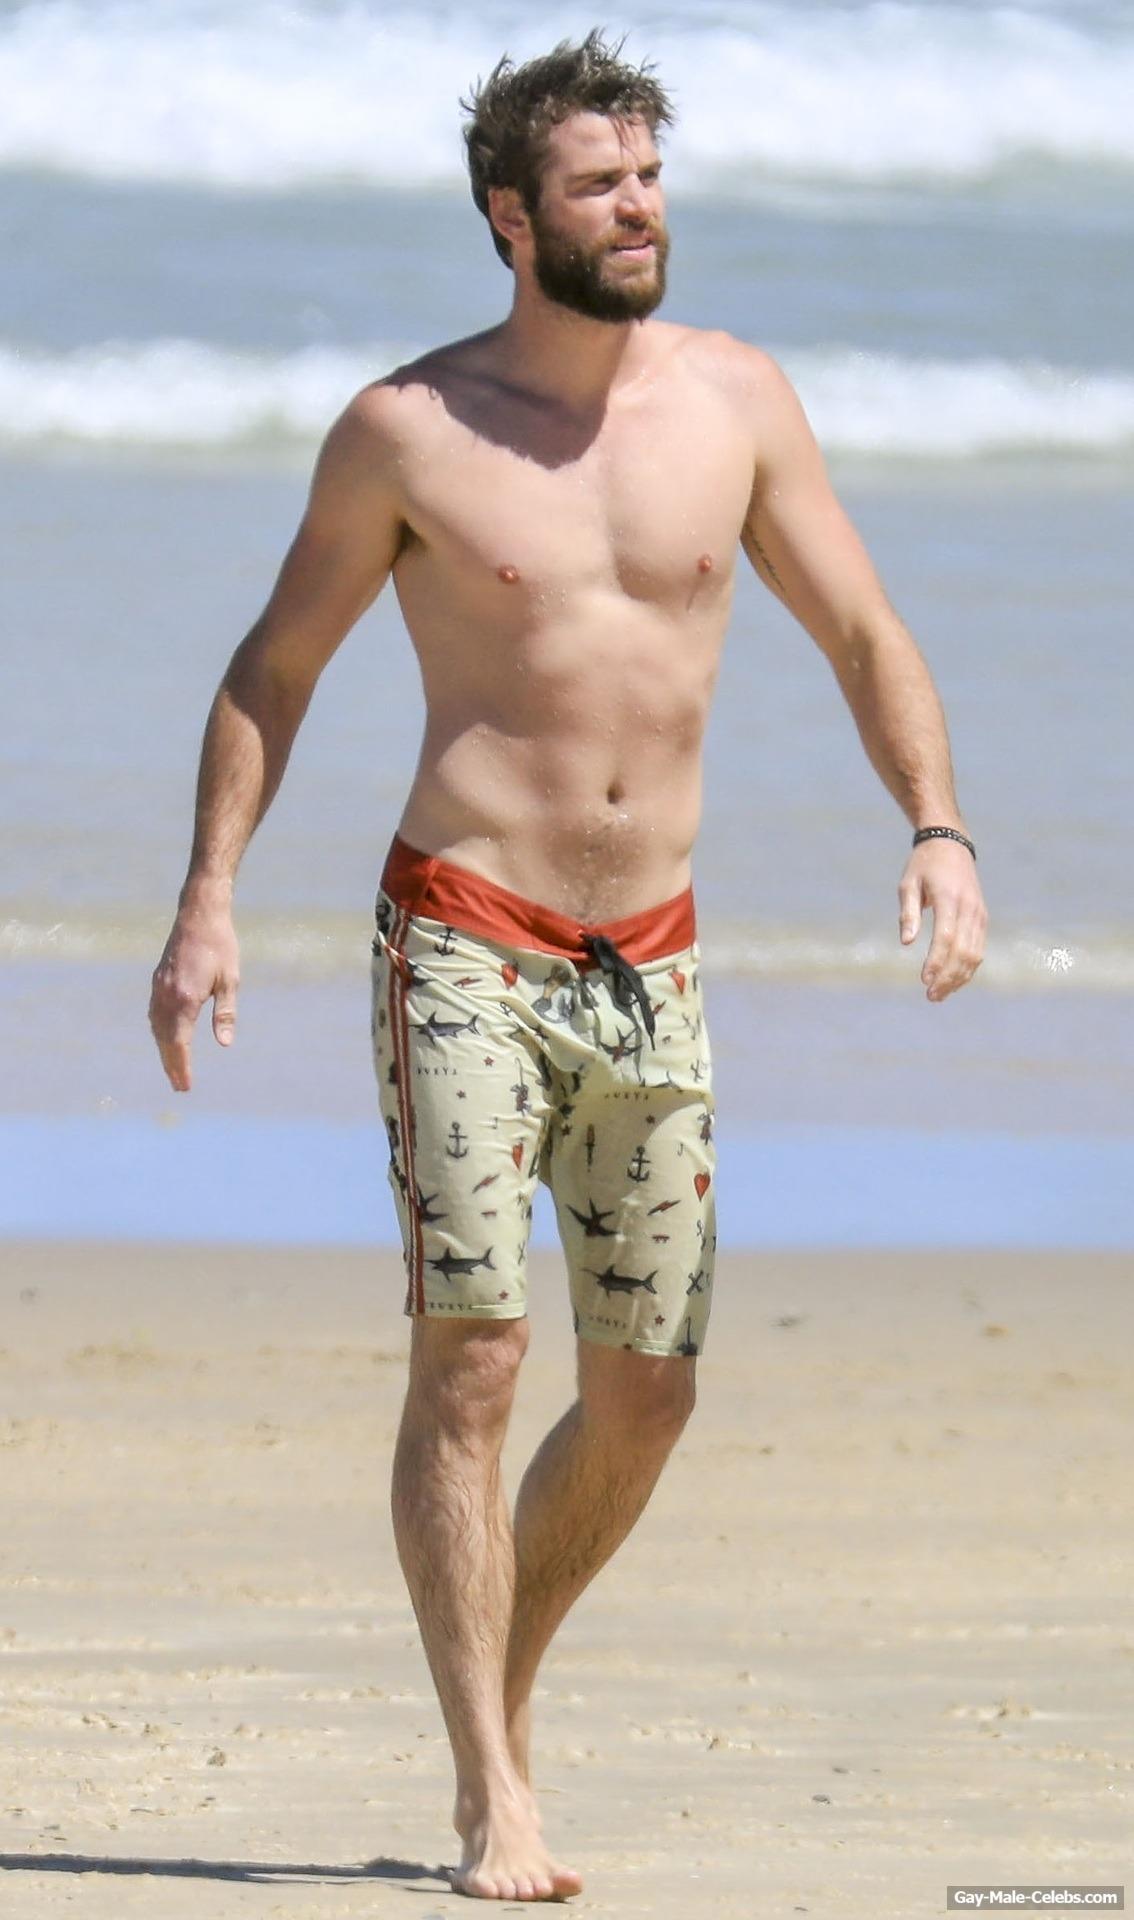 WE LOVE HOT GUYS: Chris Hemsworth Goes Shirtless